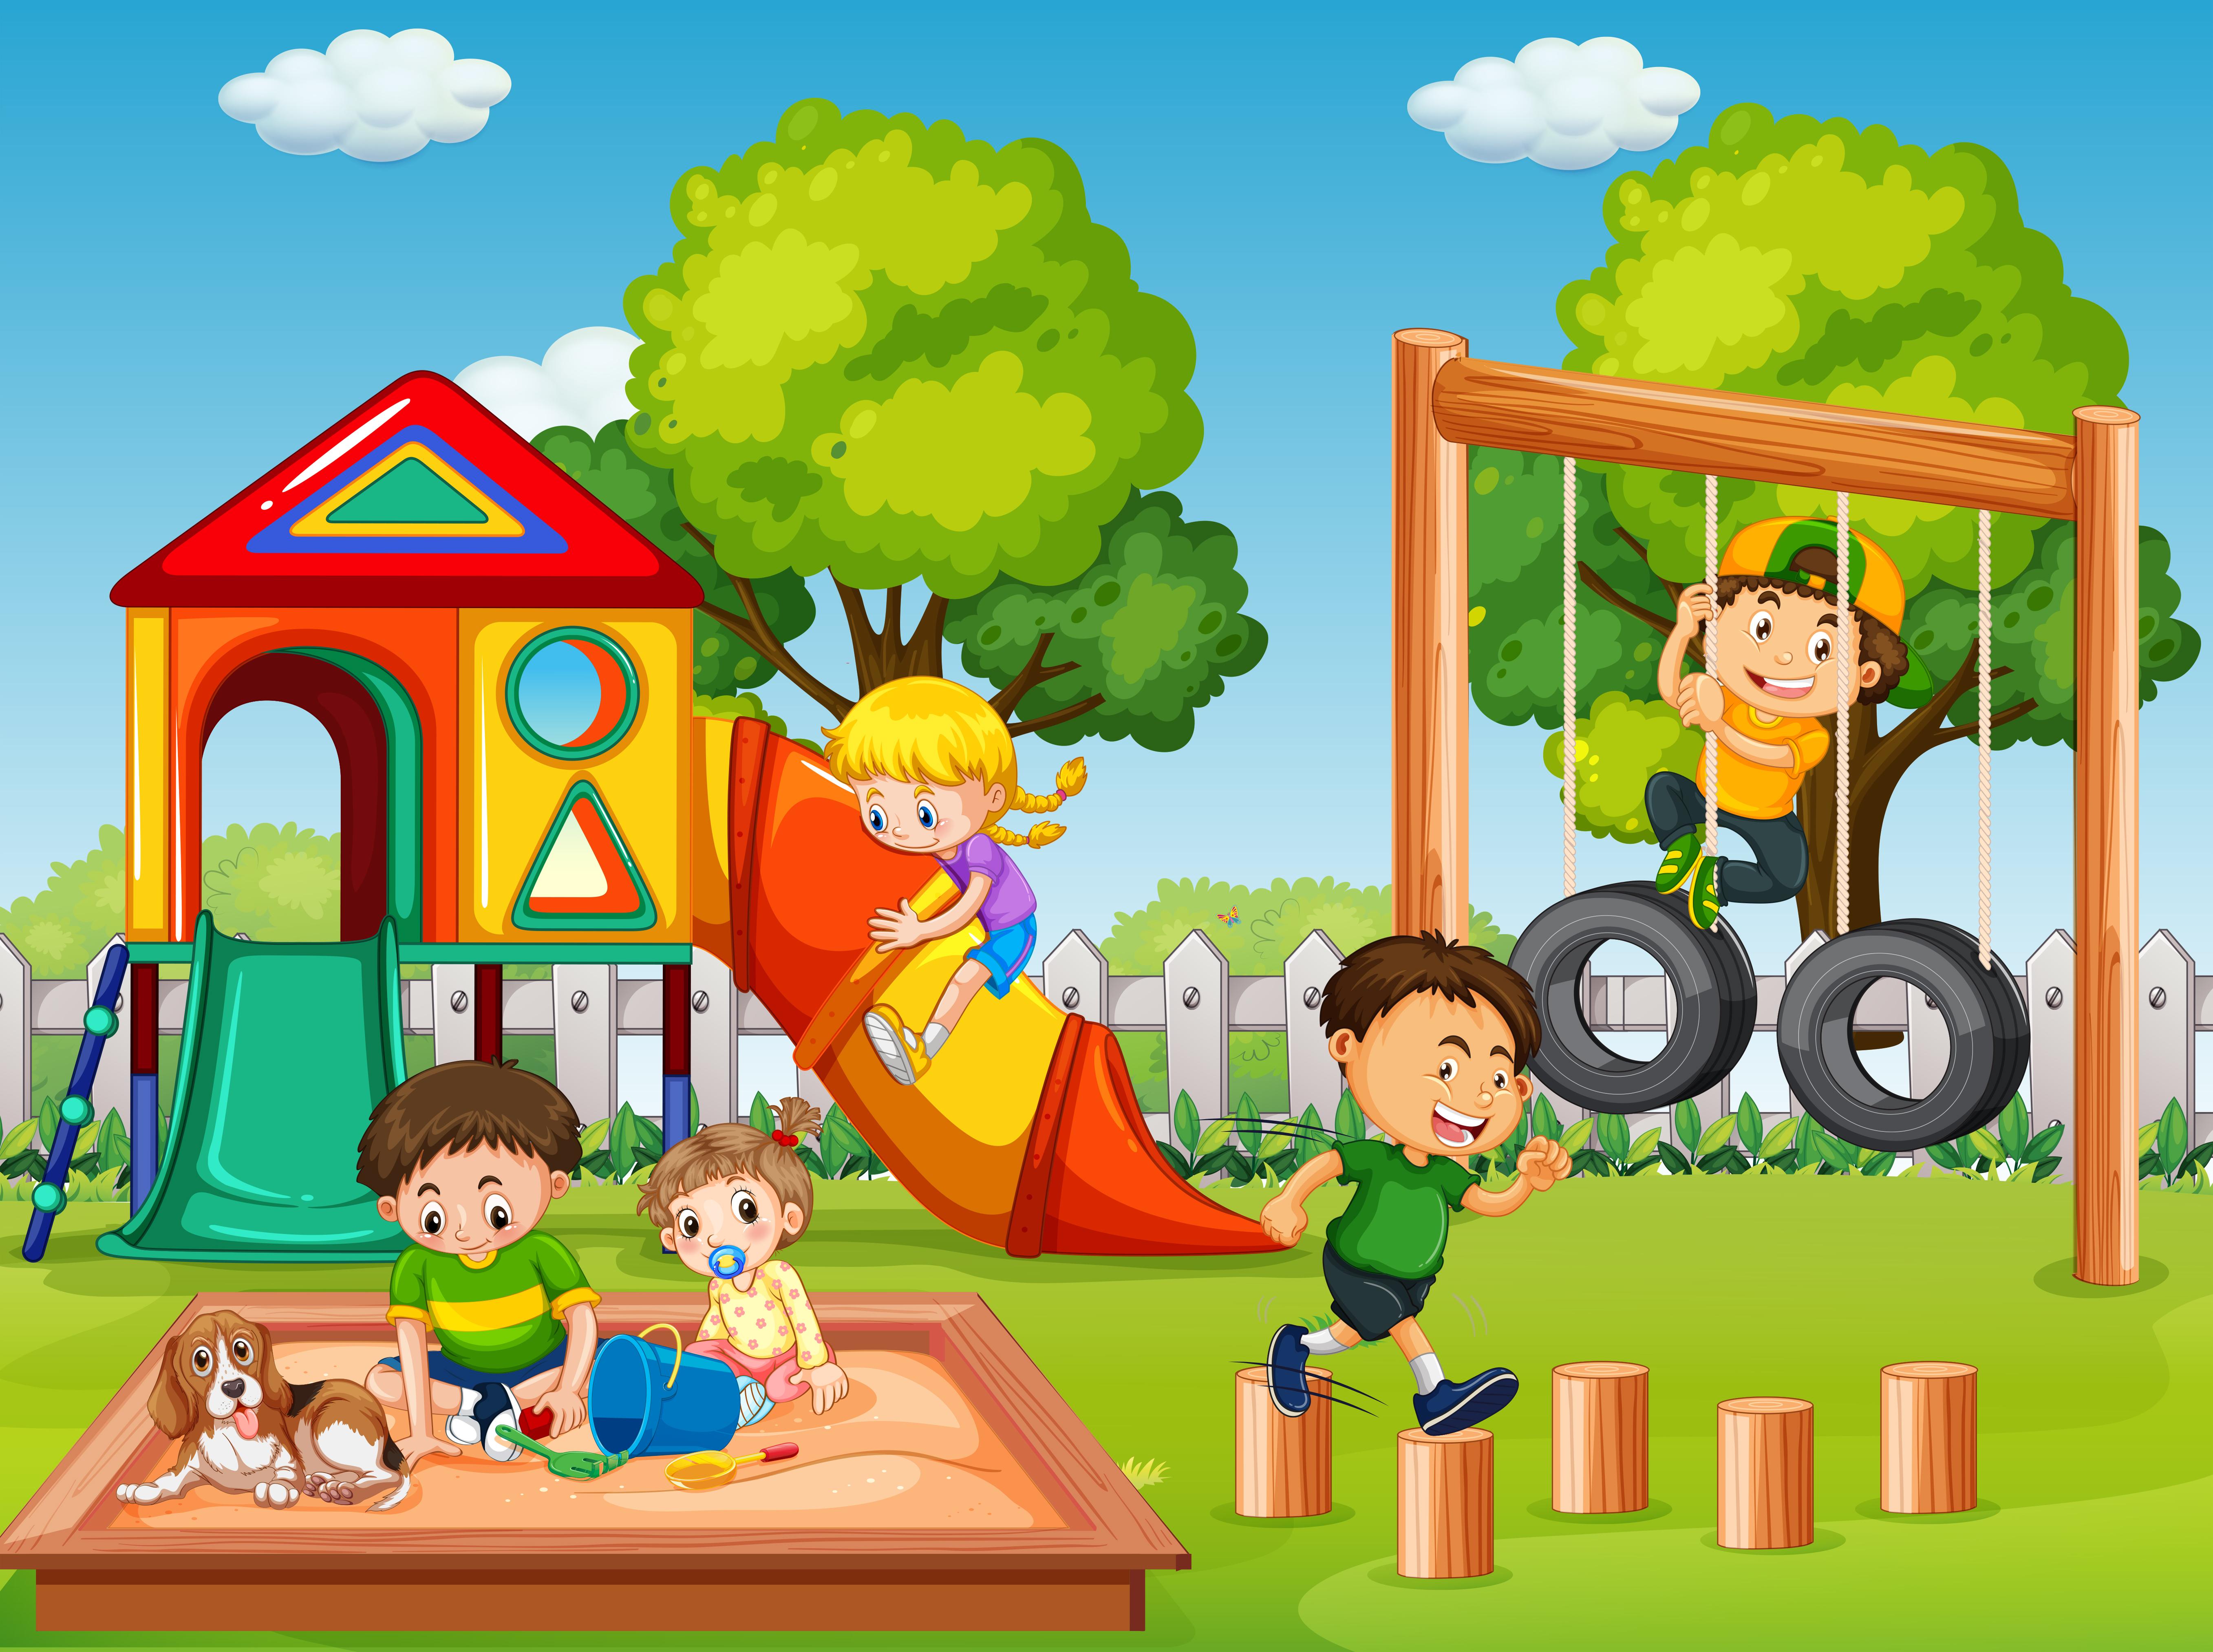 Children in playground scene - Download Free Vectors ...